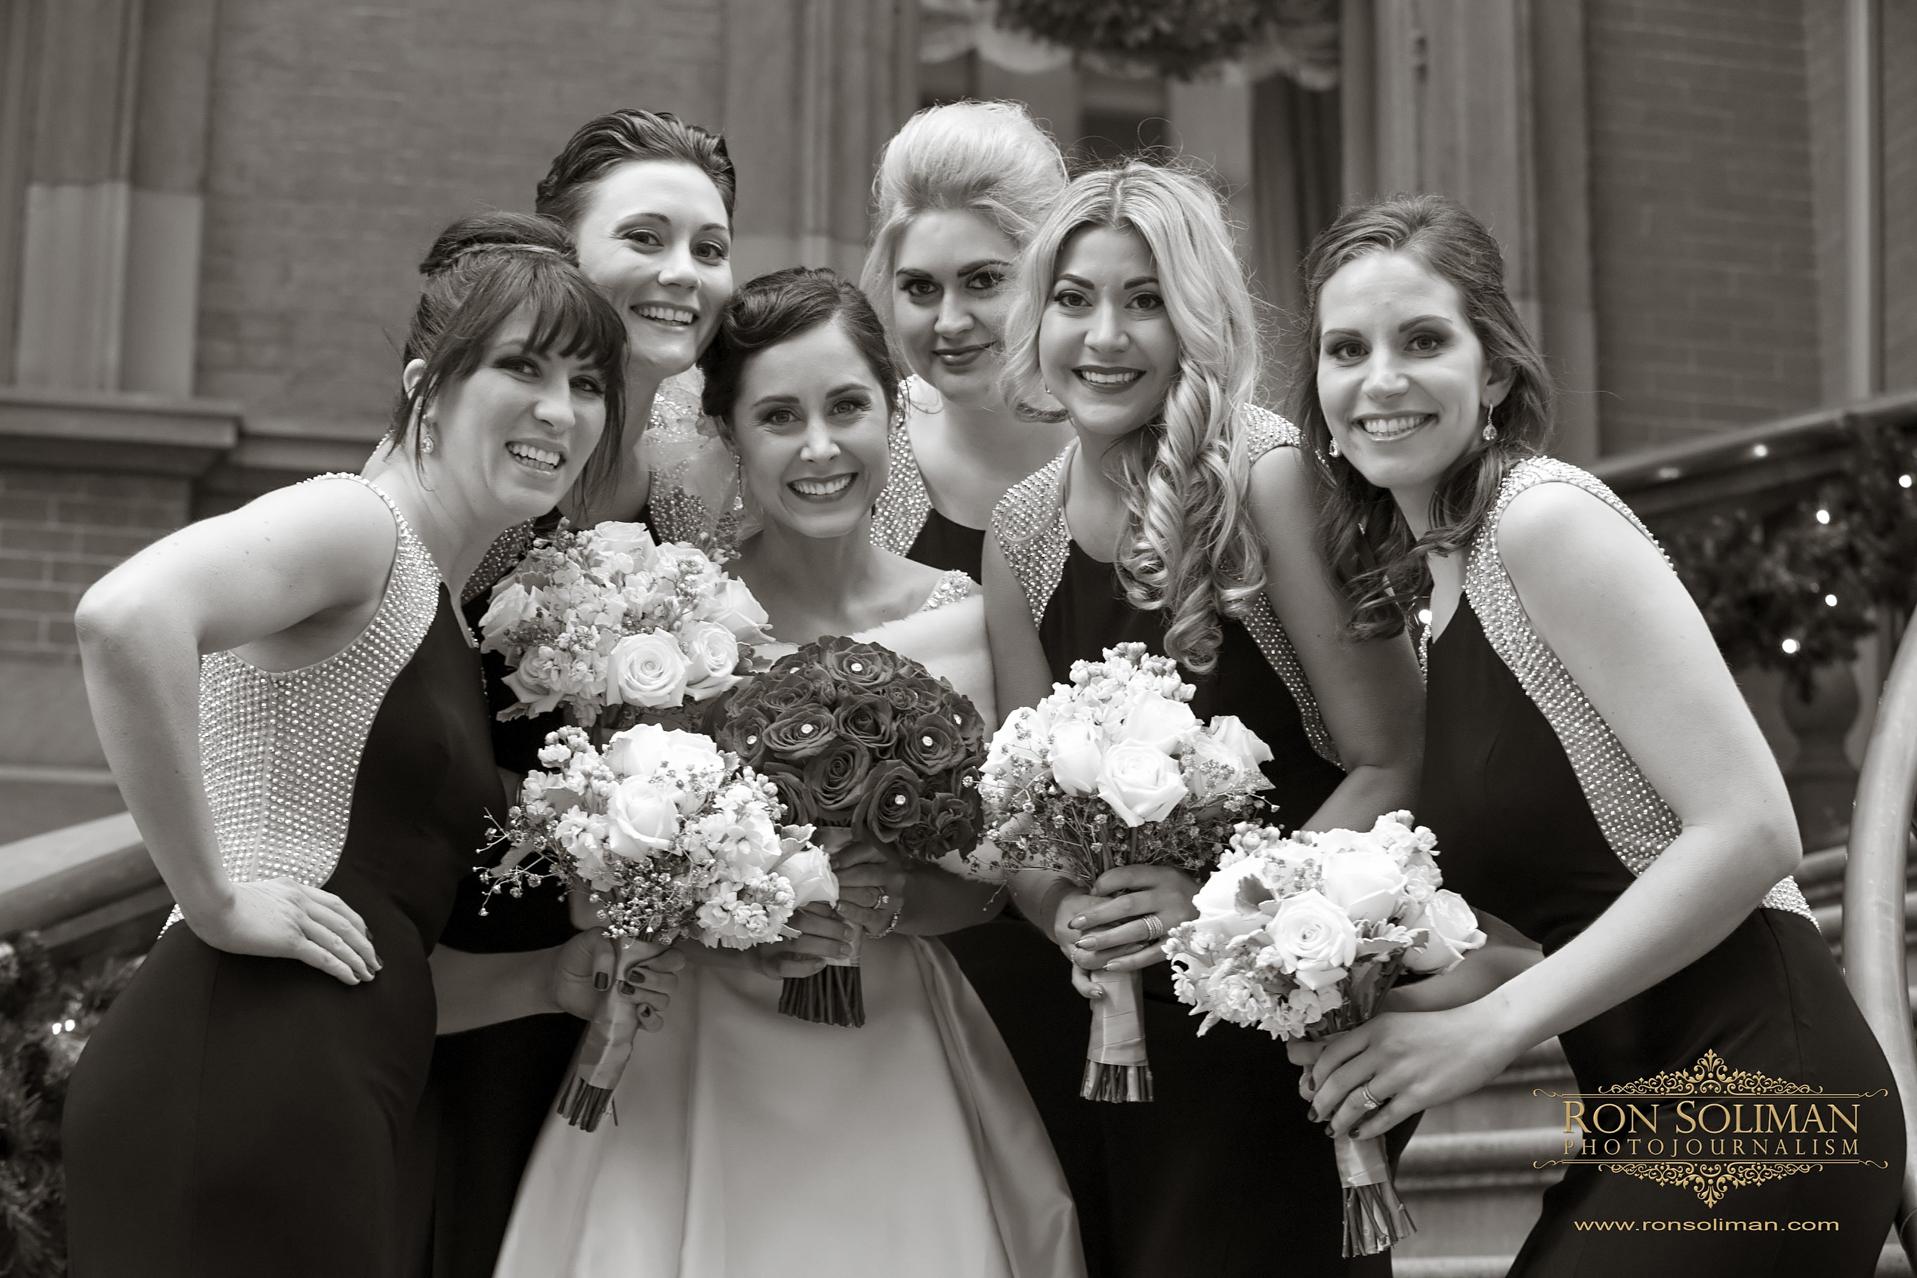 Best Black bridesmaids dresses